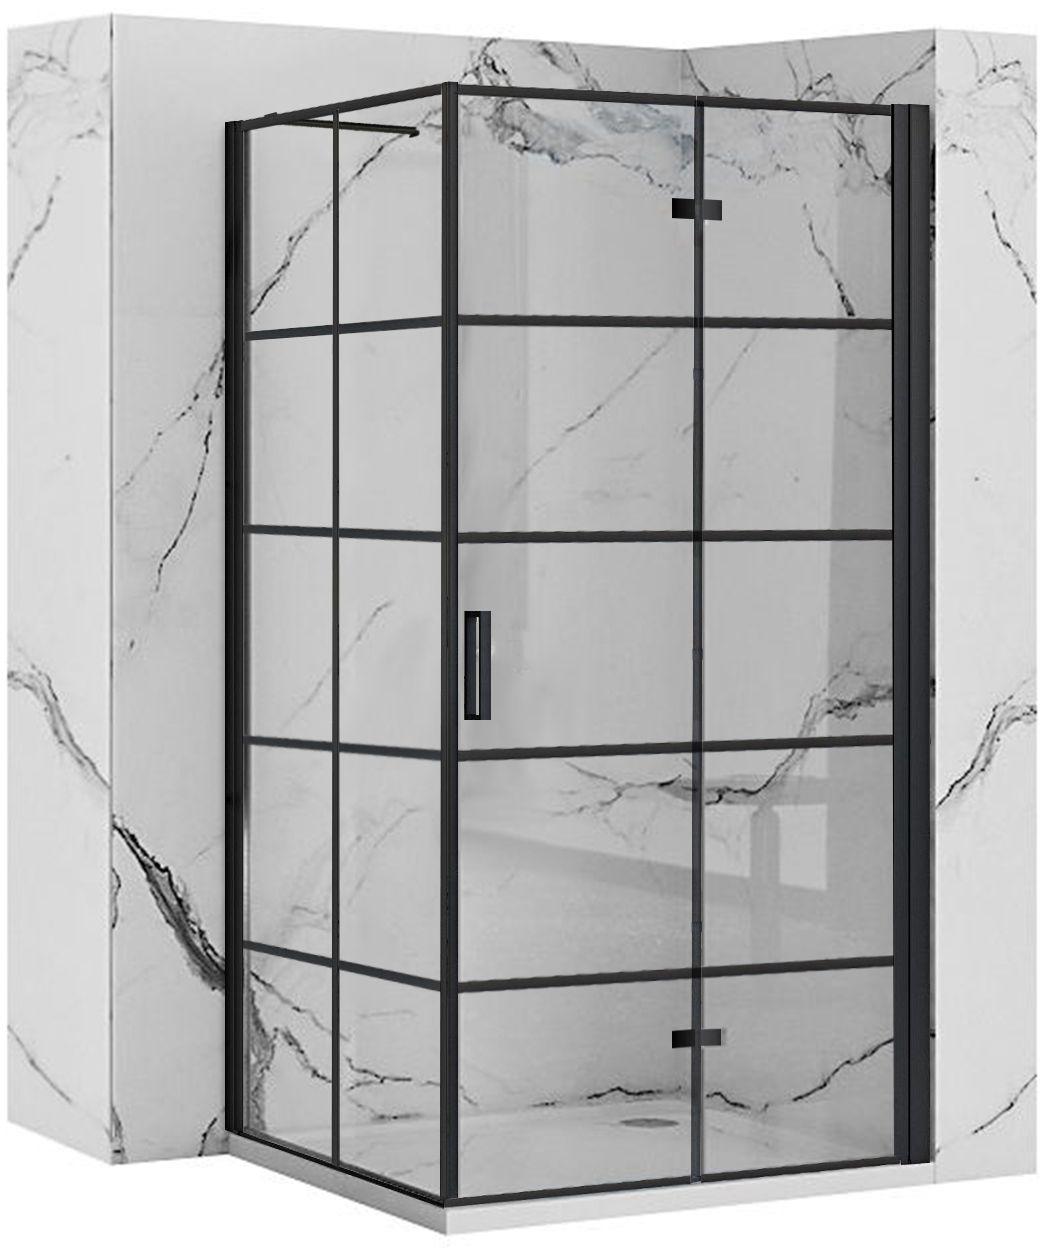 REA/S - Sprchovací kút Moliere dvere / stena 90x90 BLACK MOLDS090090B